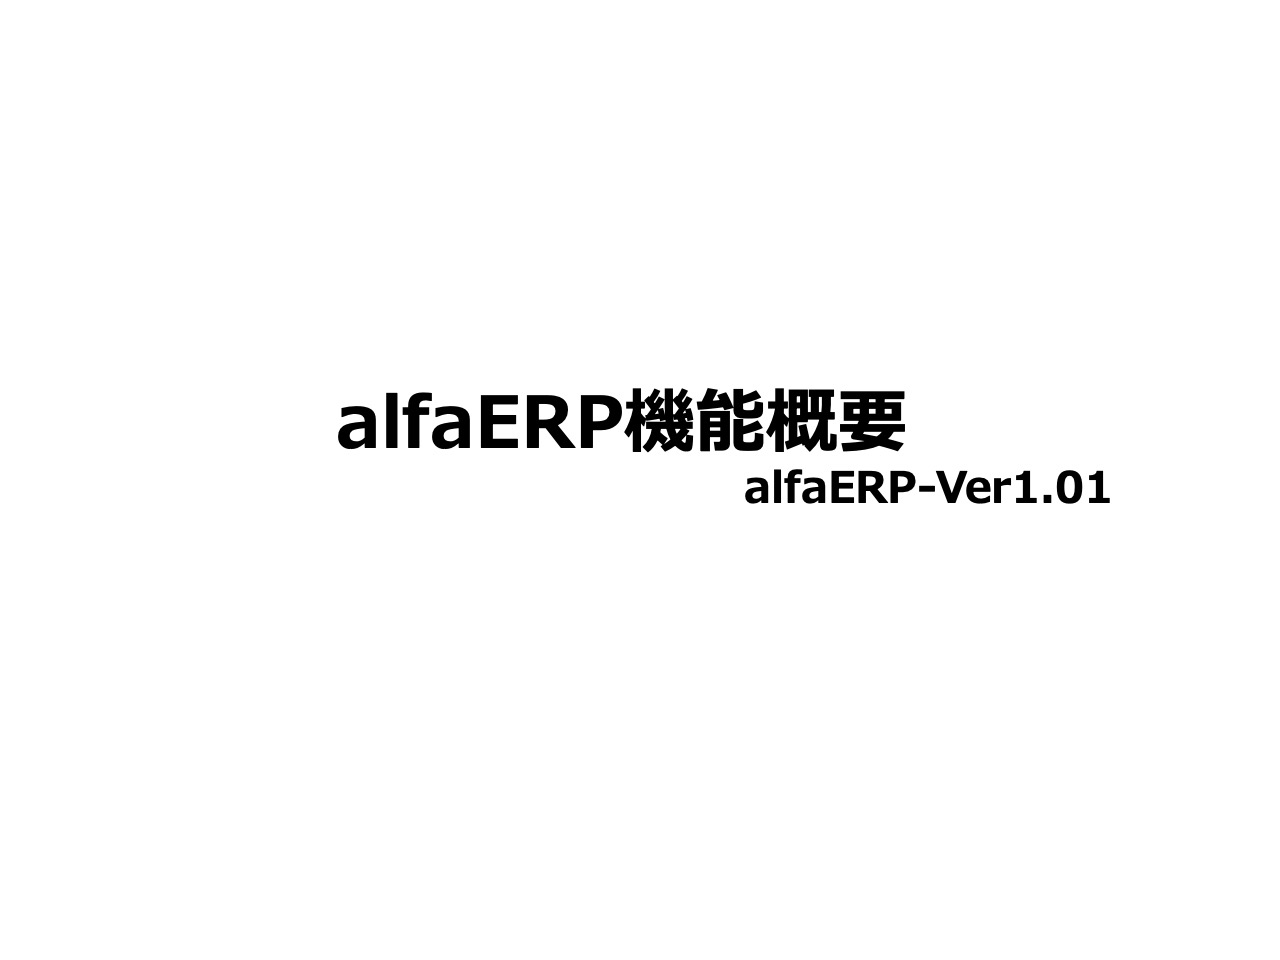 08-alfaERP機能概要20200507